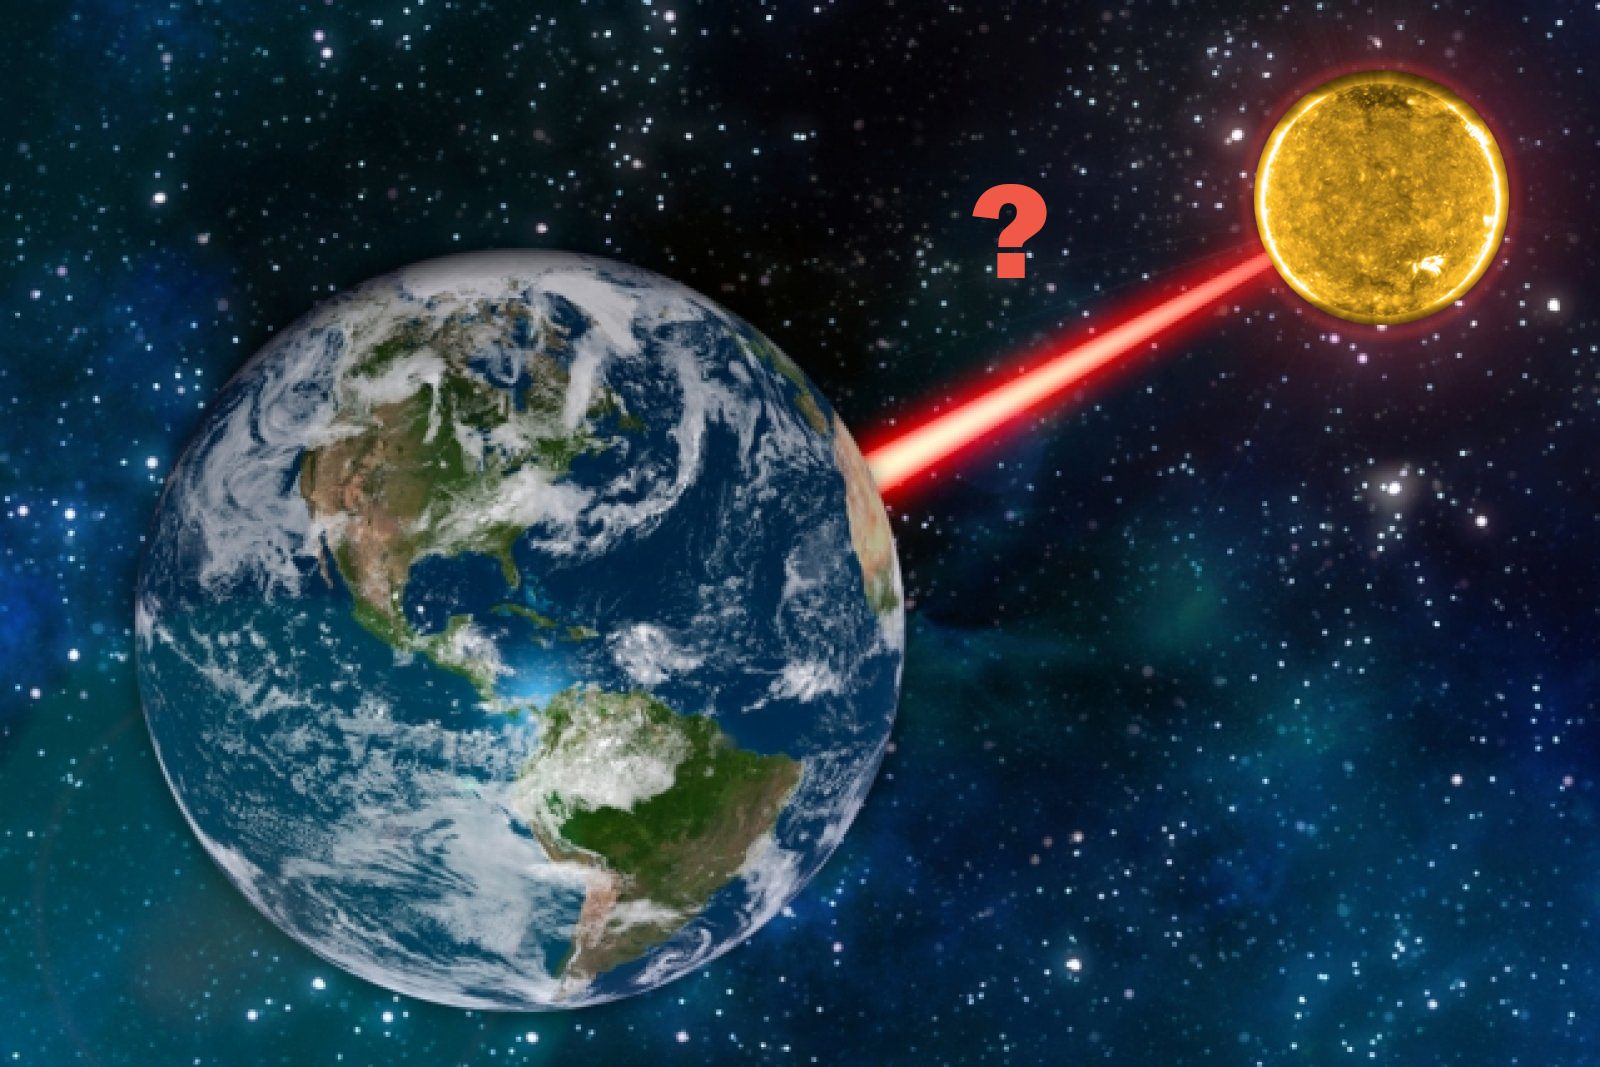 Как измерили расстояние до Солнца